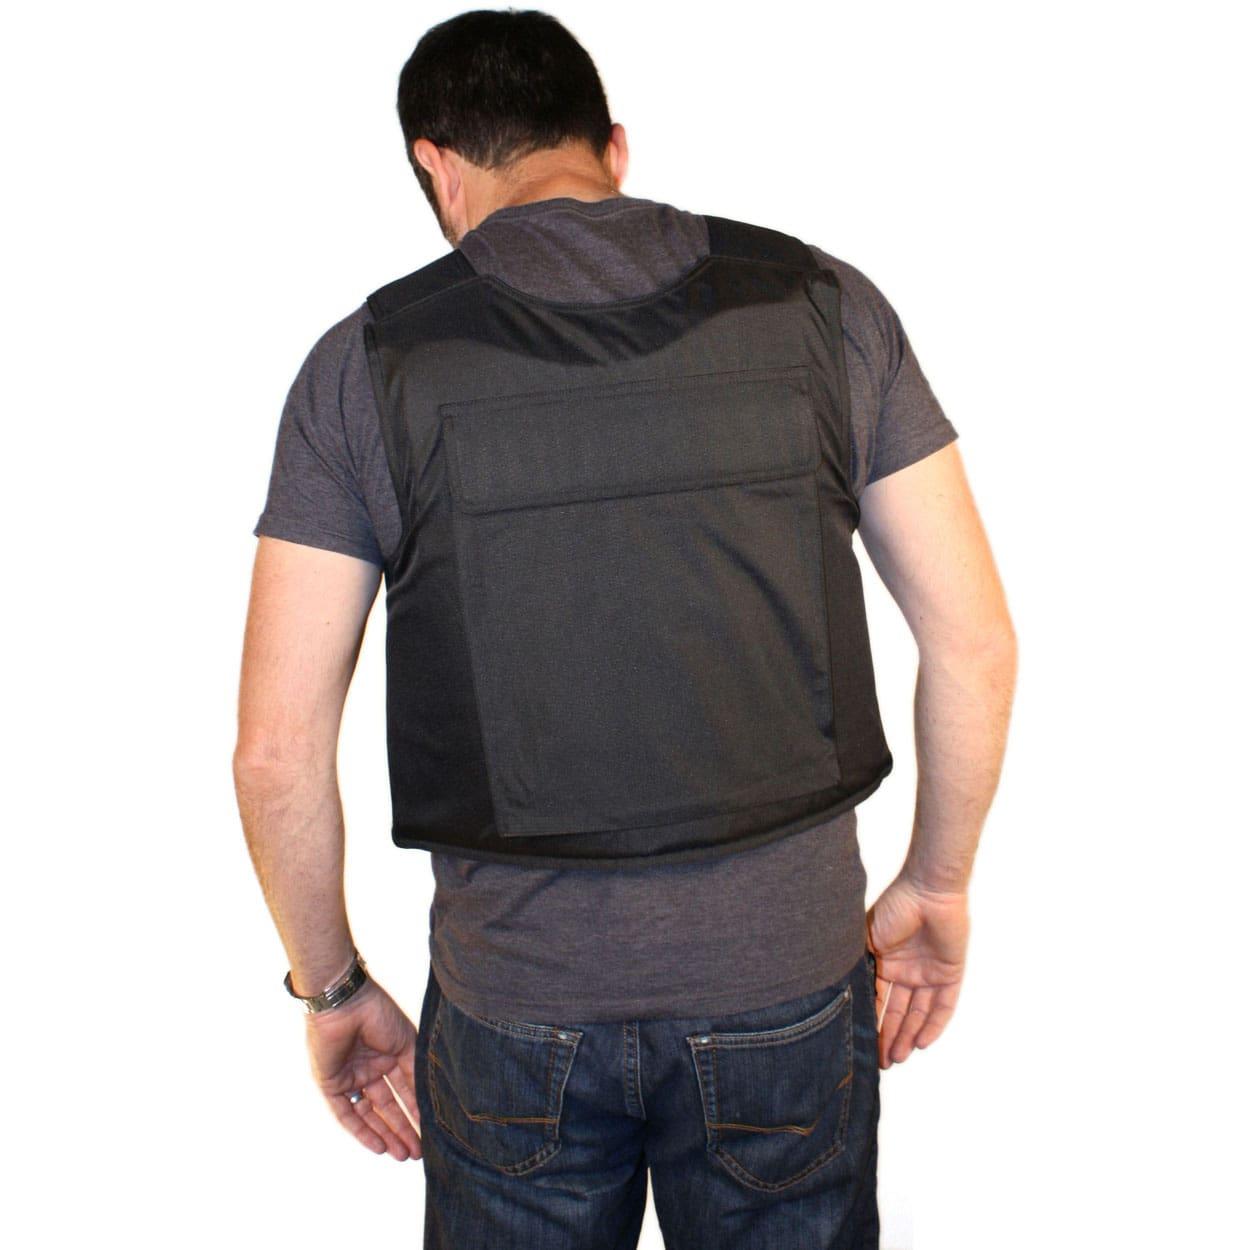 bulletsafe-vest-back-view-min.jpg